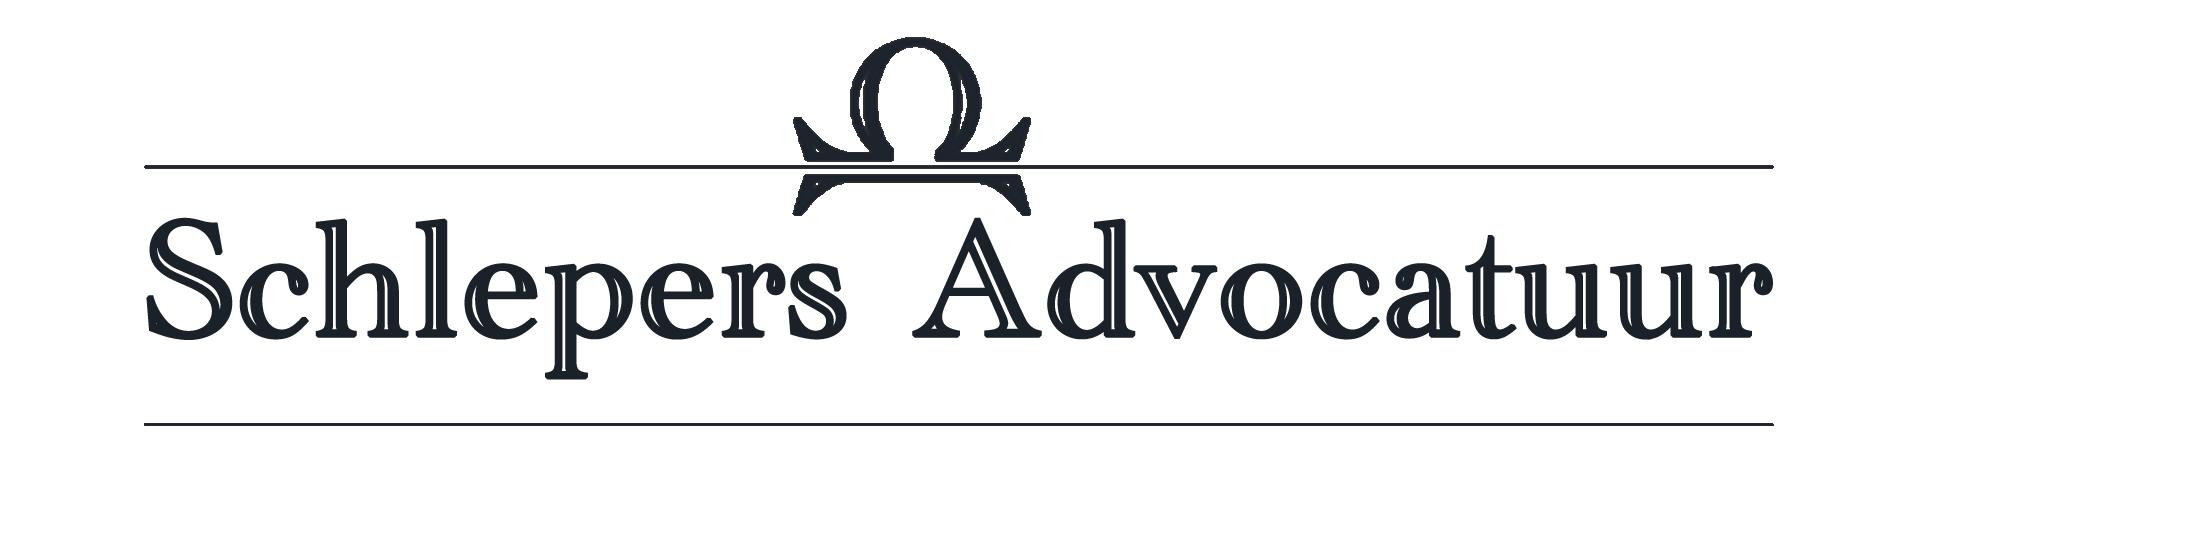 Schlepers Advocatuur